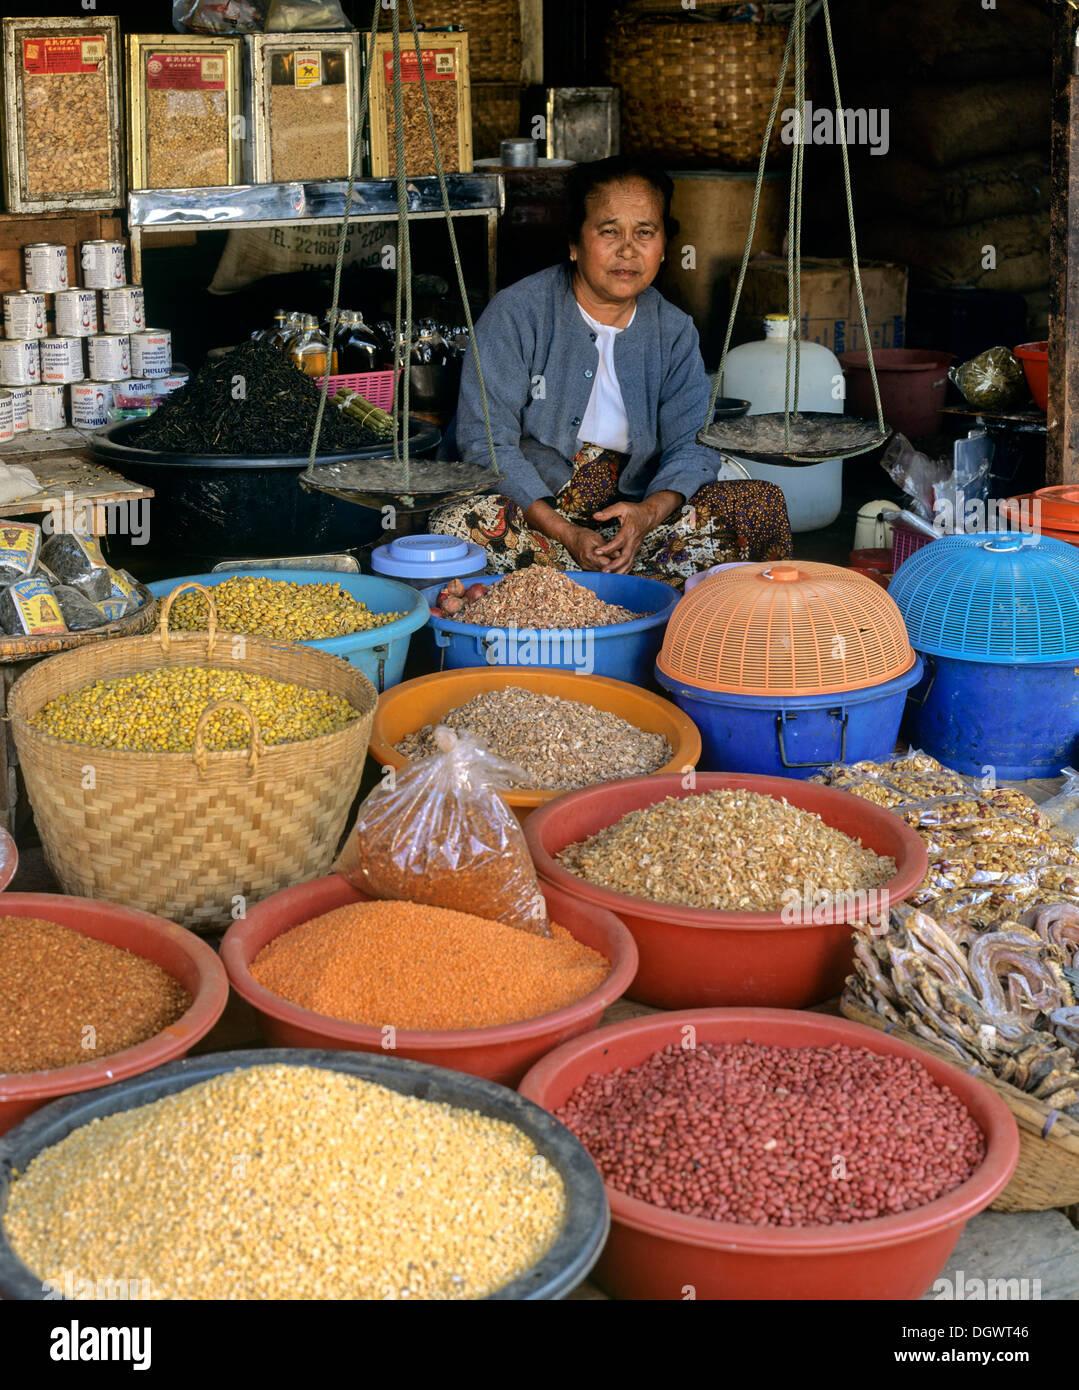 Woman selling spices, peas and beans, Rangun, Yangon Region